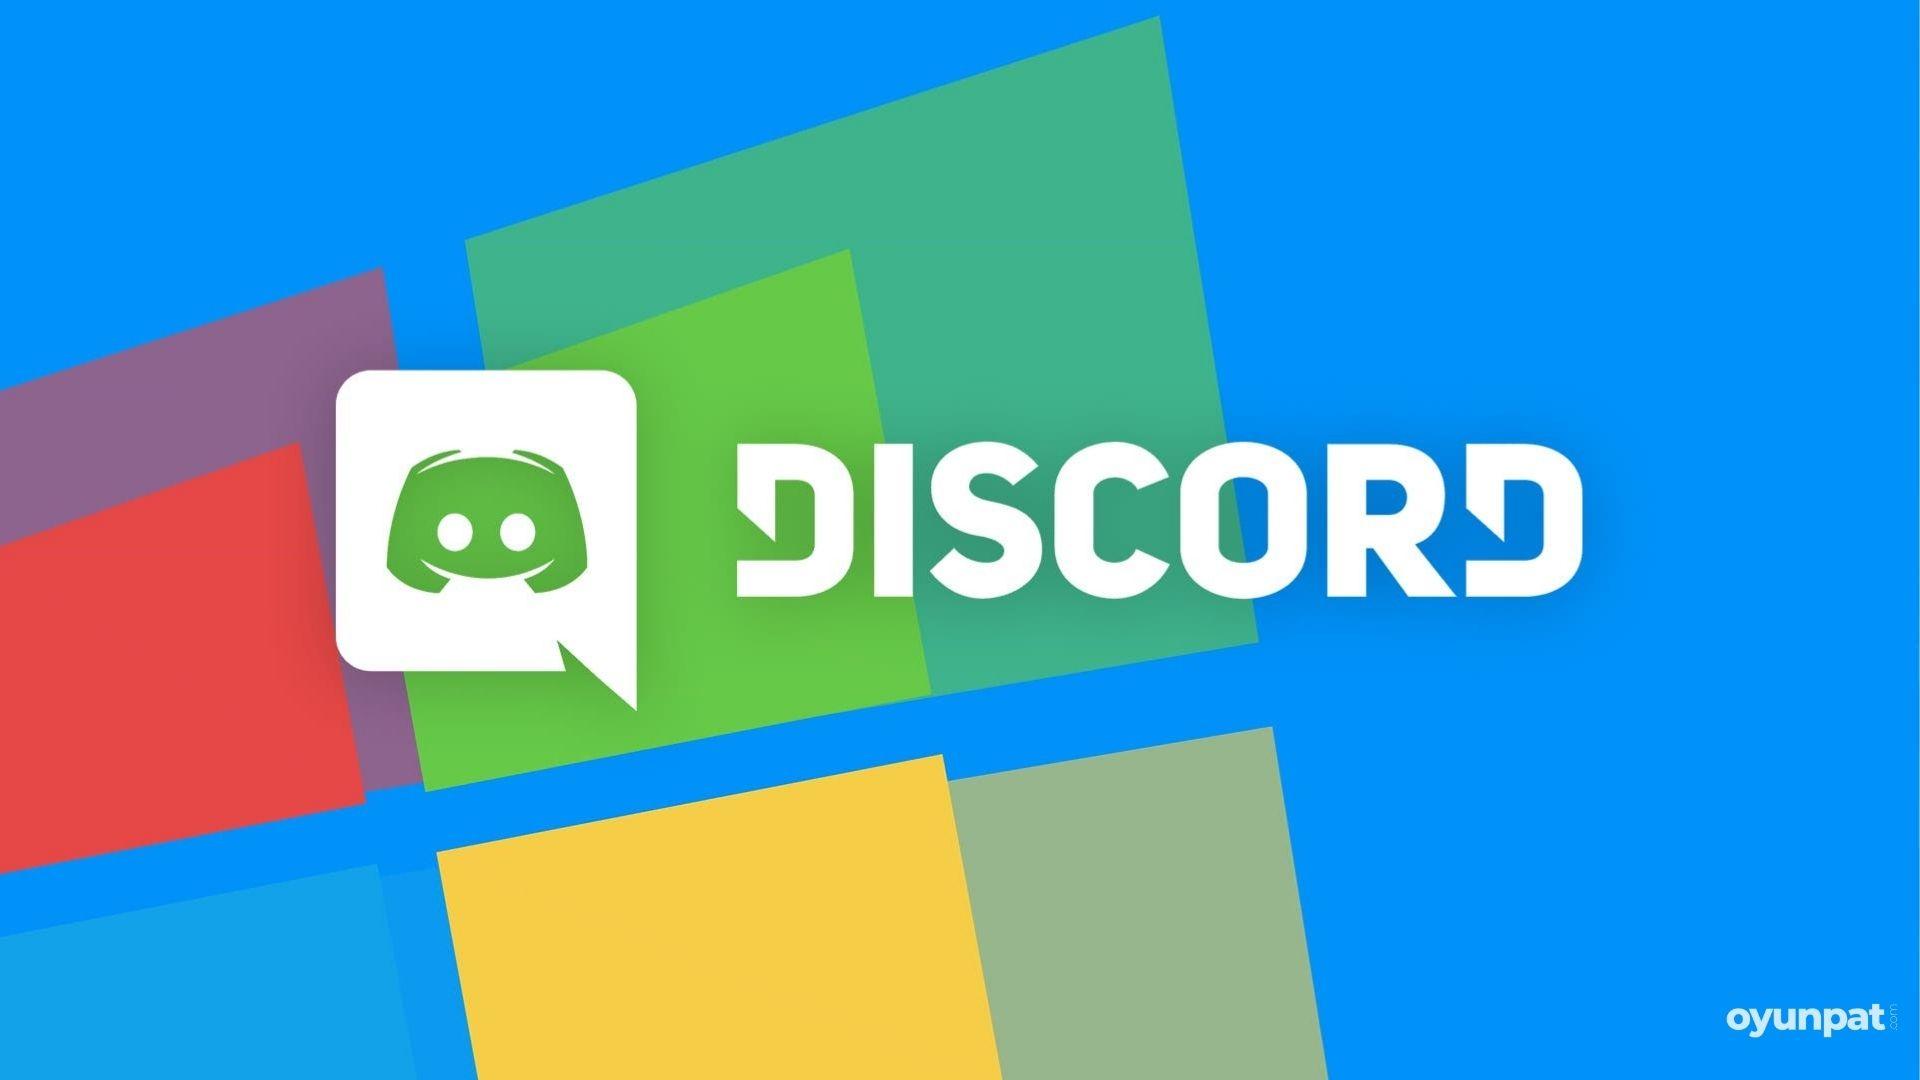 Microsoft Discord 1-oyunpat